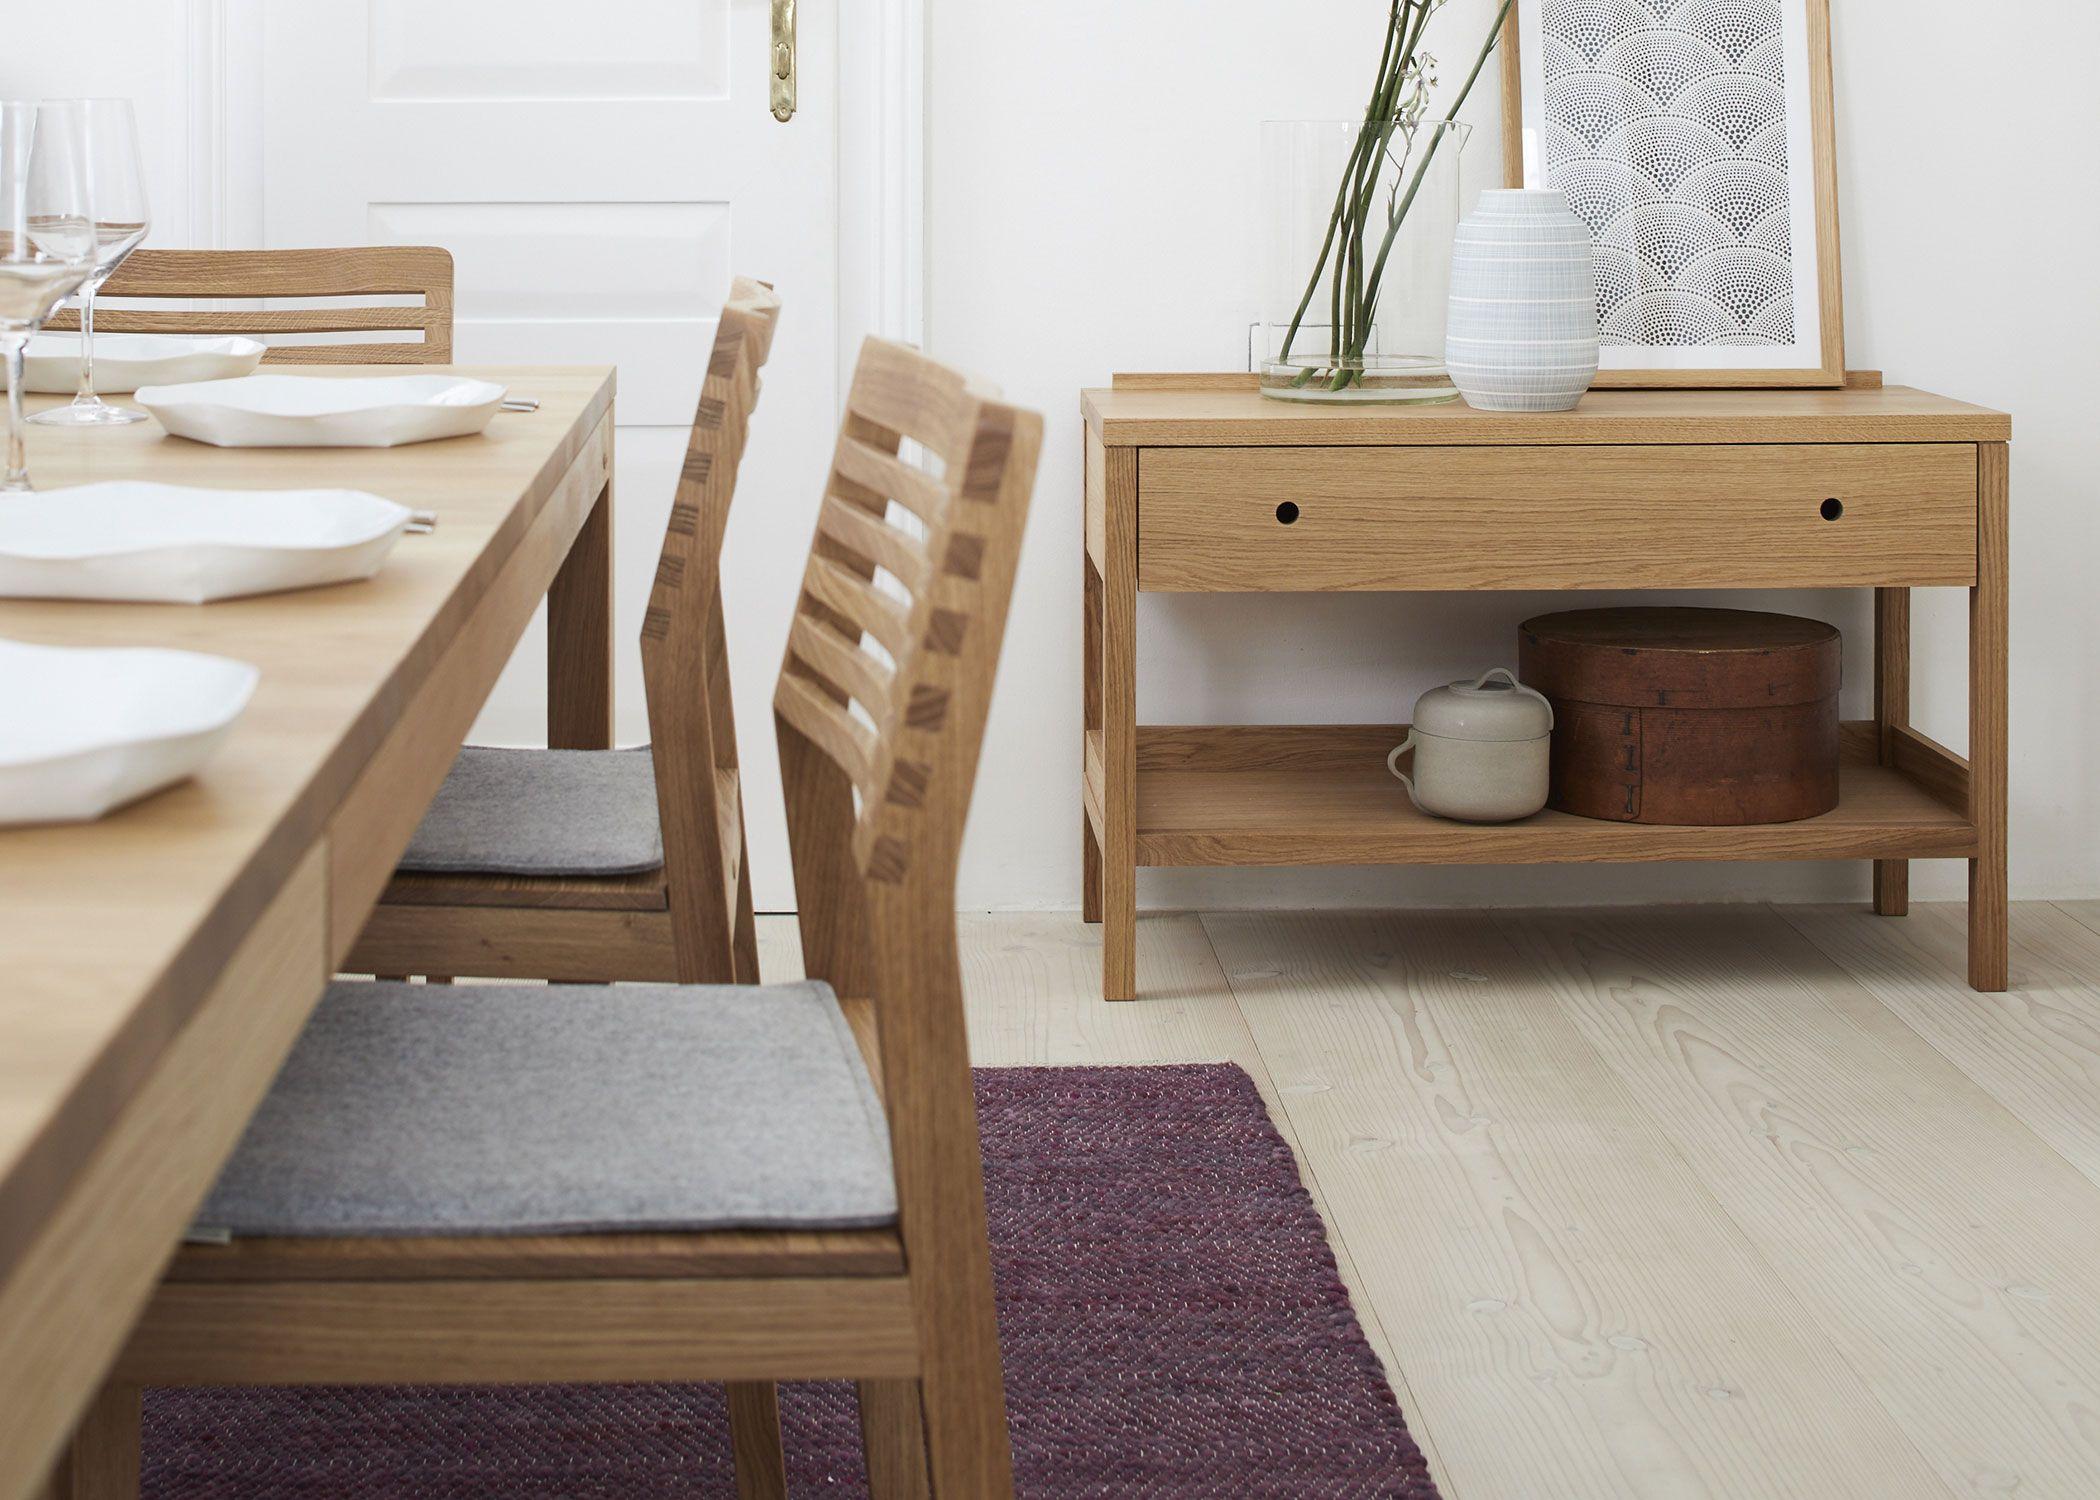 Set 2 Stk Stuhl Freddy Haus Deko Stühle Stuhlbeine